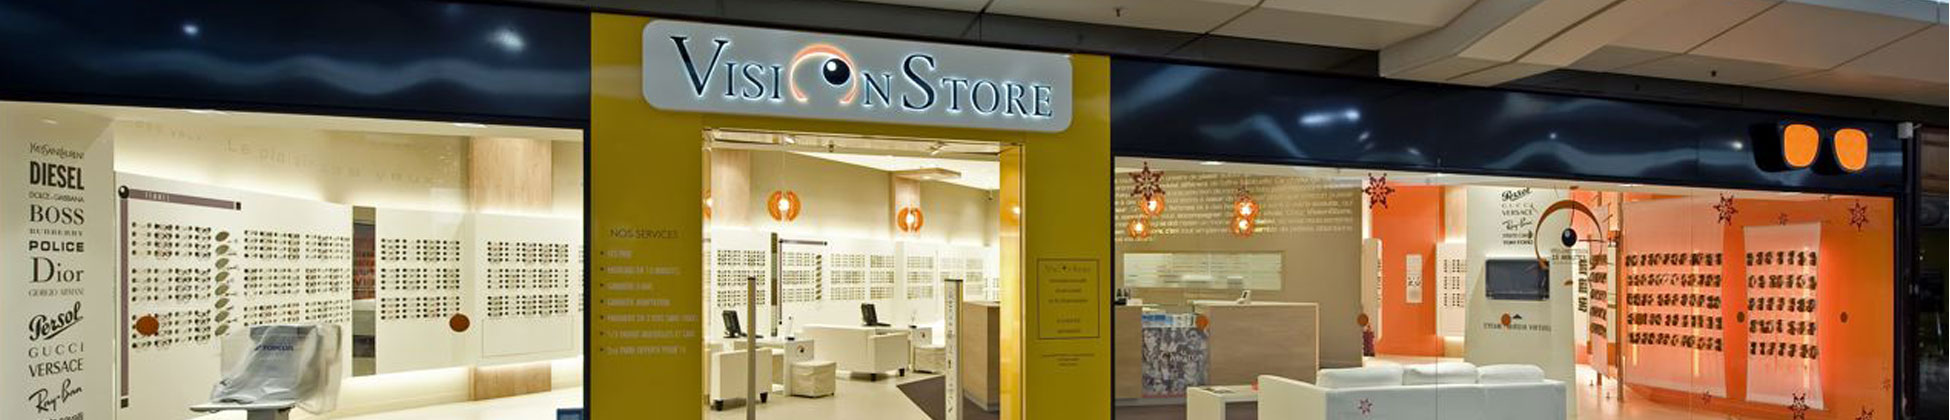 VisionStore